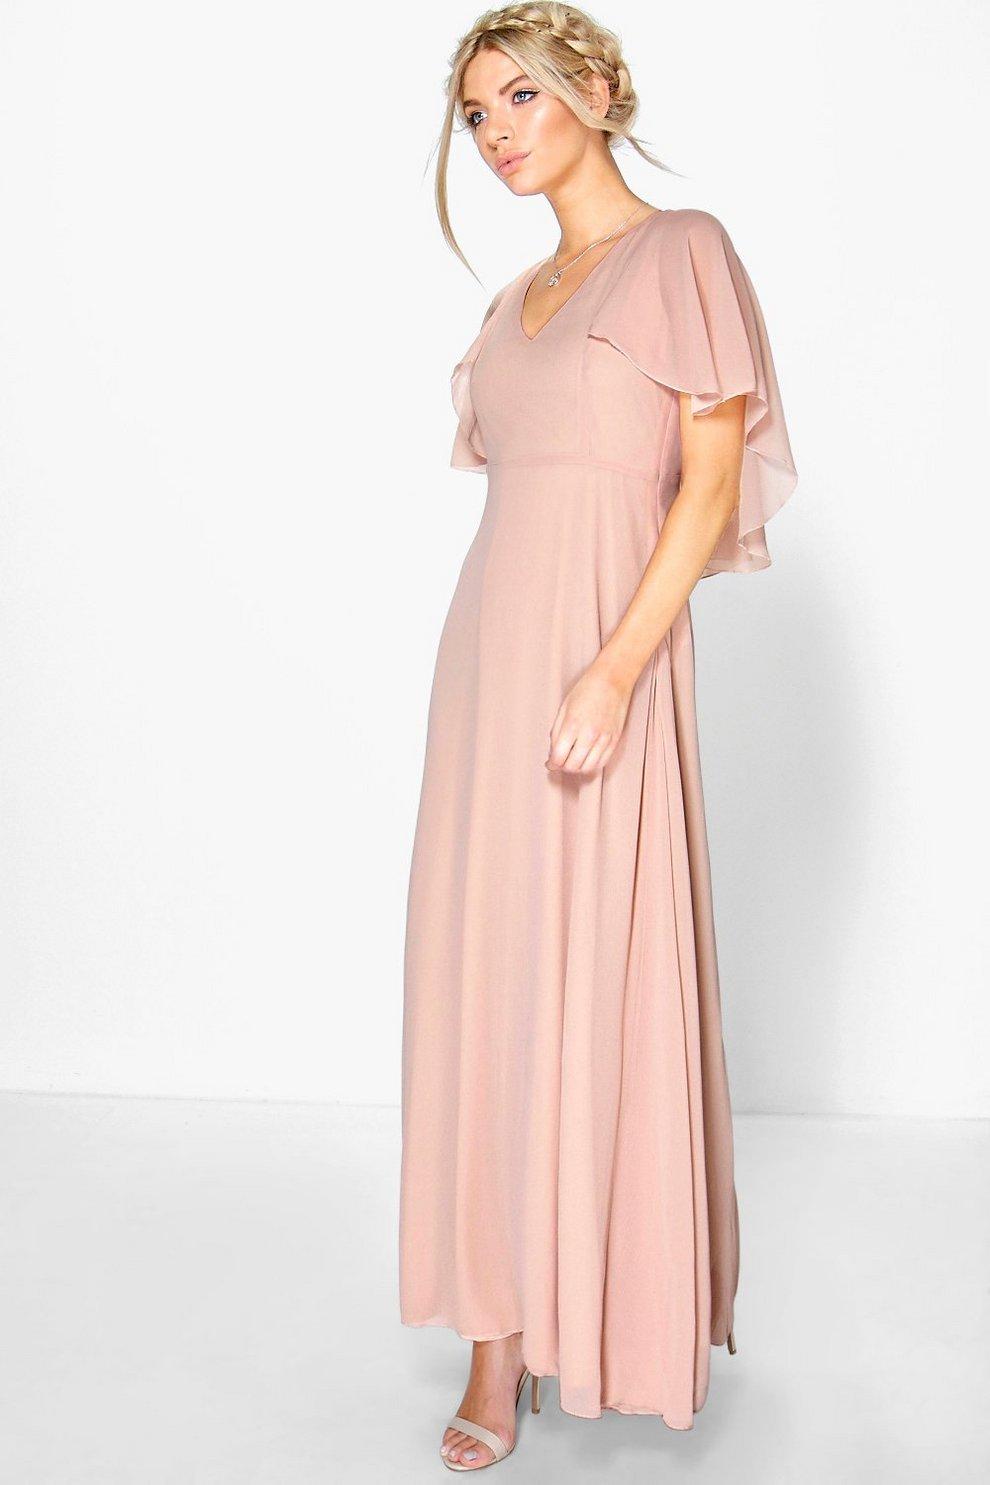 87ad91e581dd Womens Blush Chiffon Cape Detail Maxi Dress